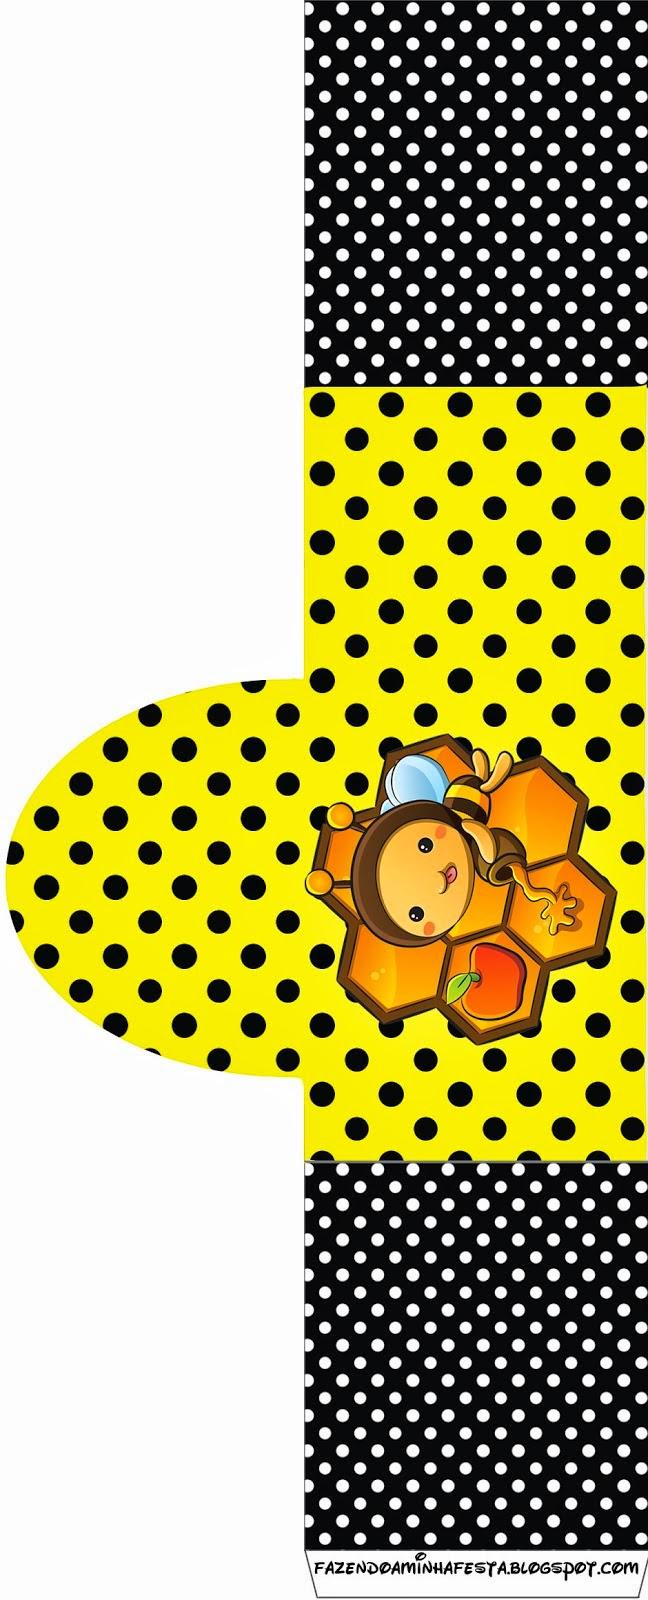 Etiquetas de Abejitas Bebé para imprimir gratis